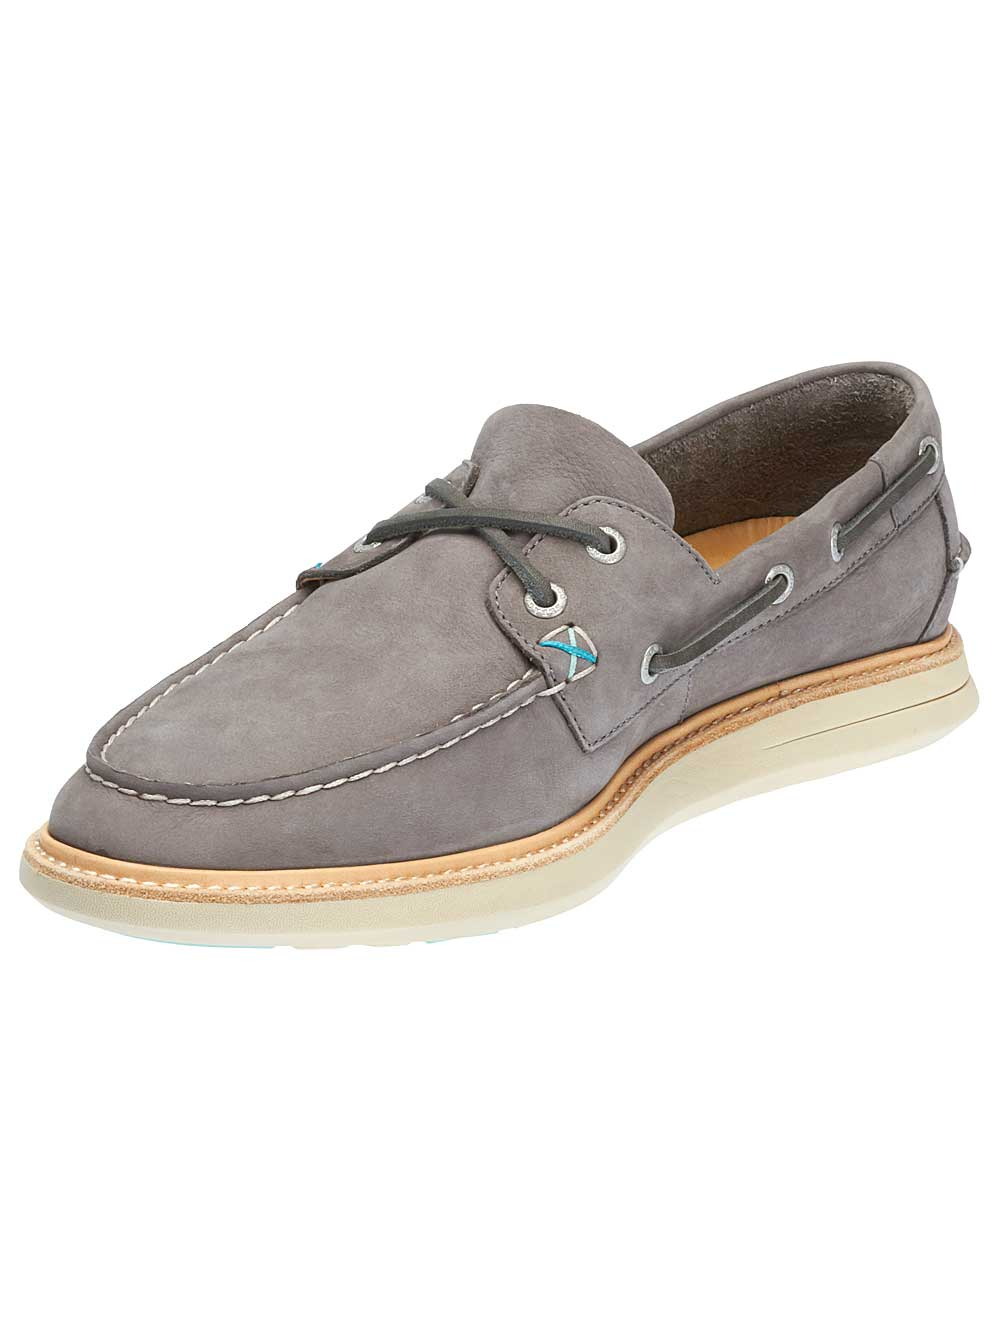 Sebago Mens Smyth Two Eye Boat Shoes in Dark Grey Nubuck